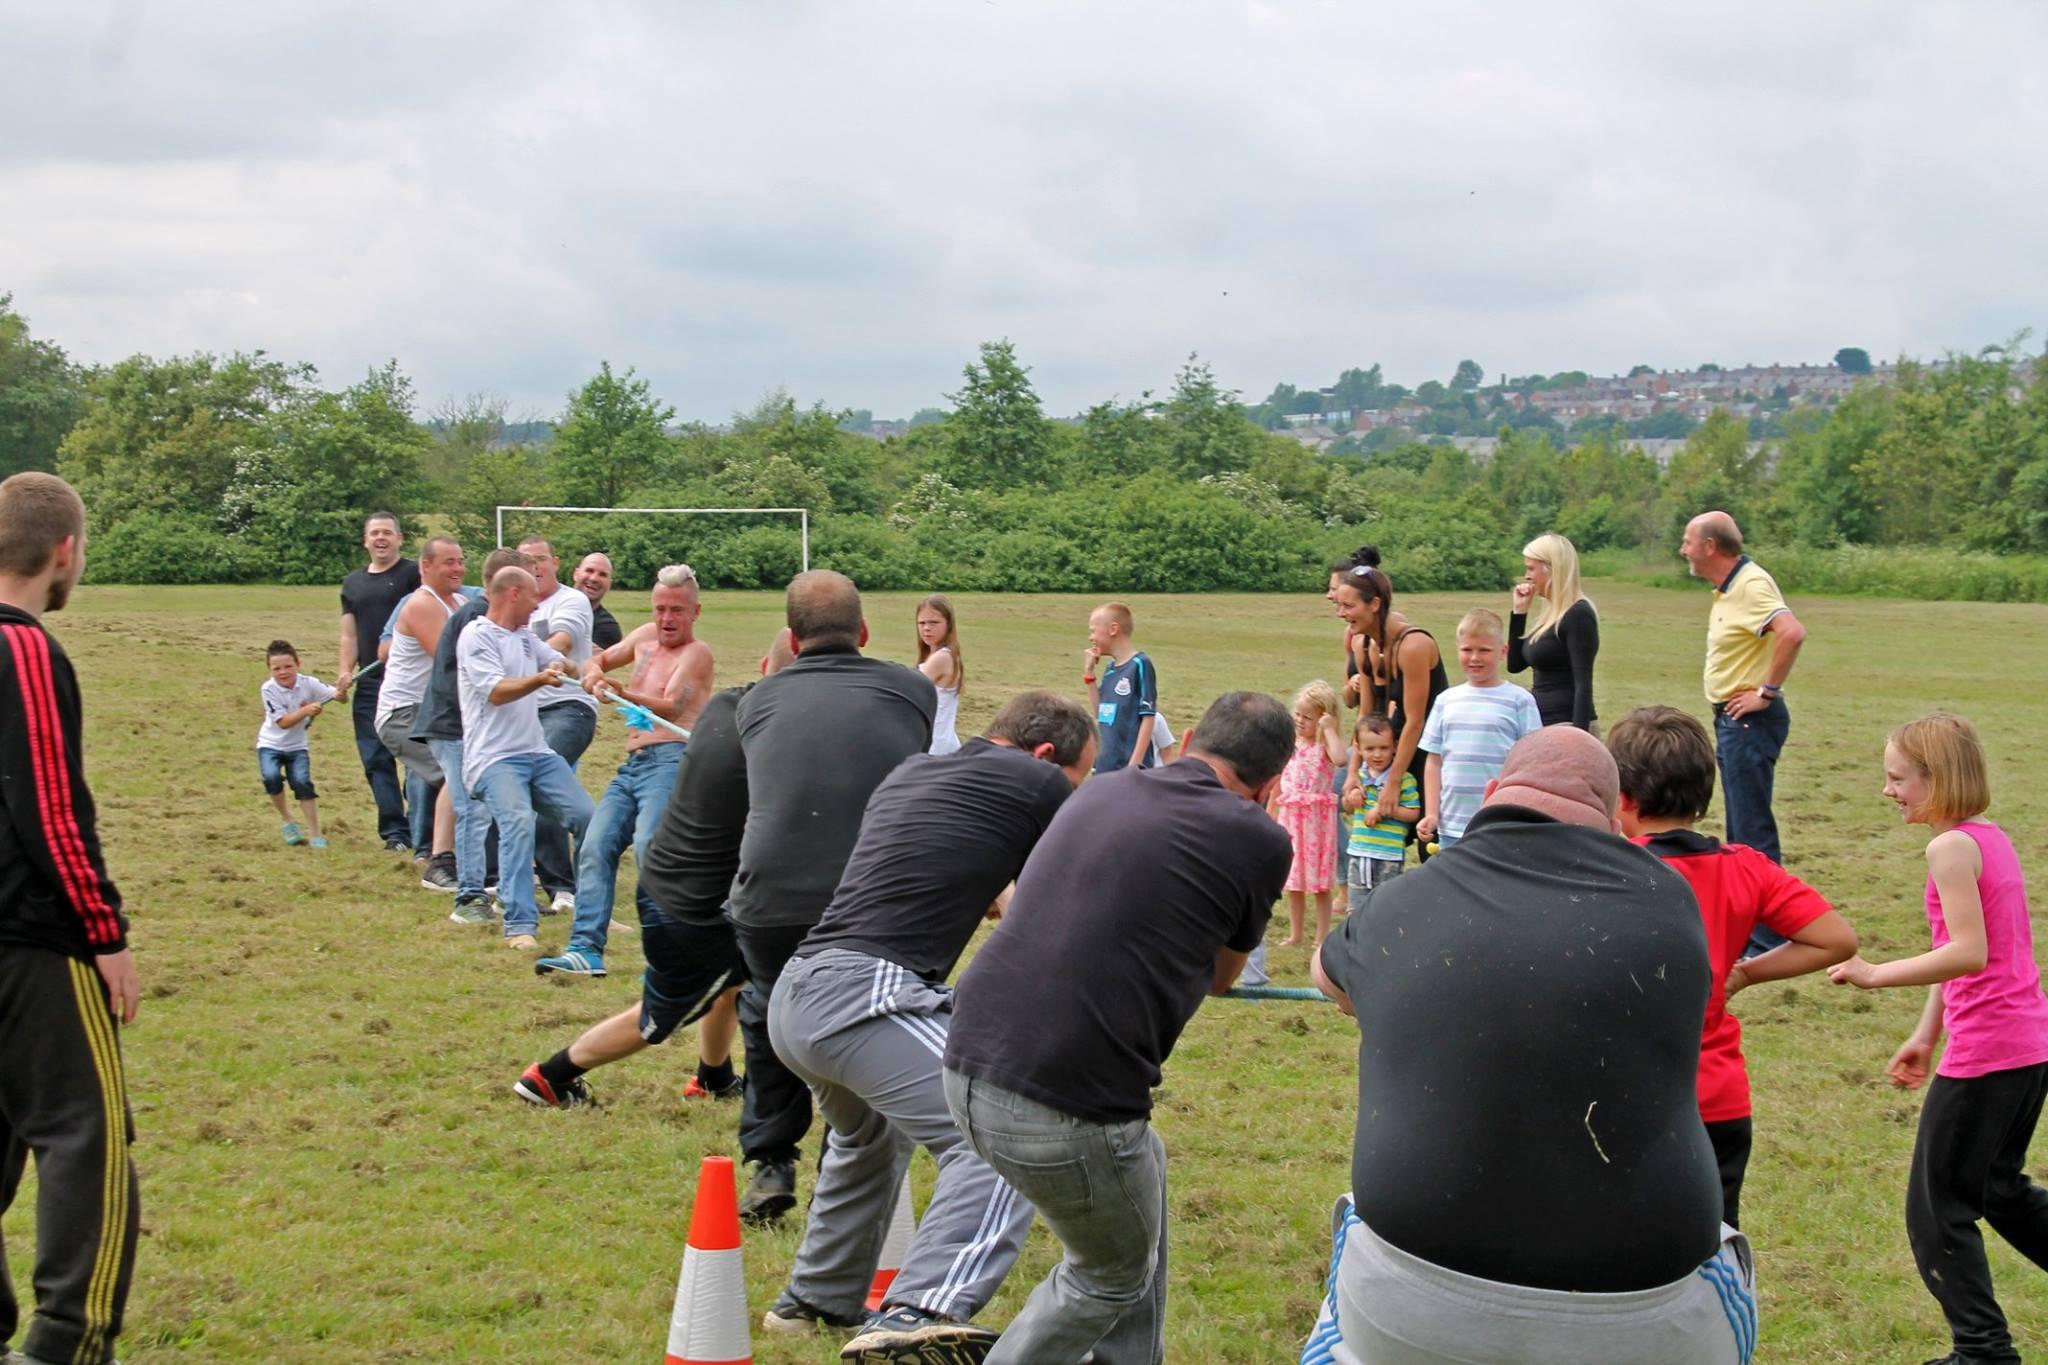 Craghead Fun Day 2014